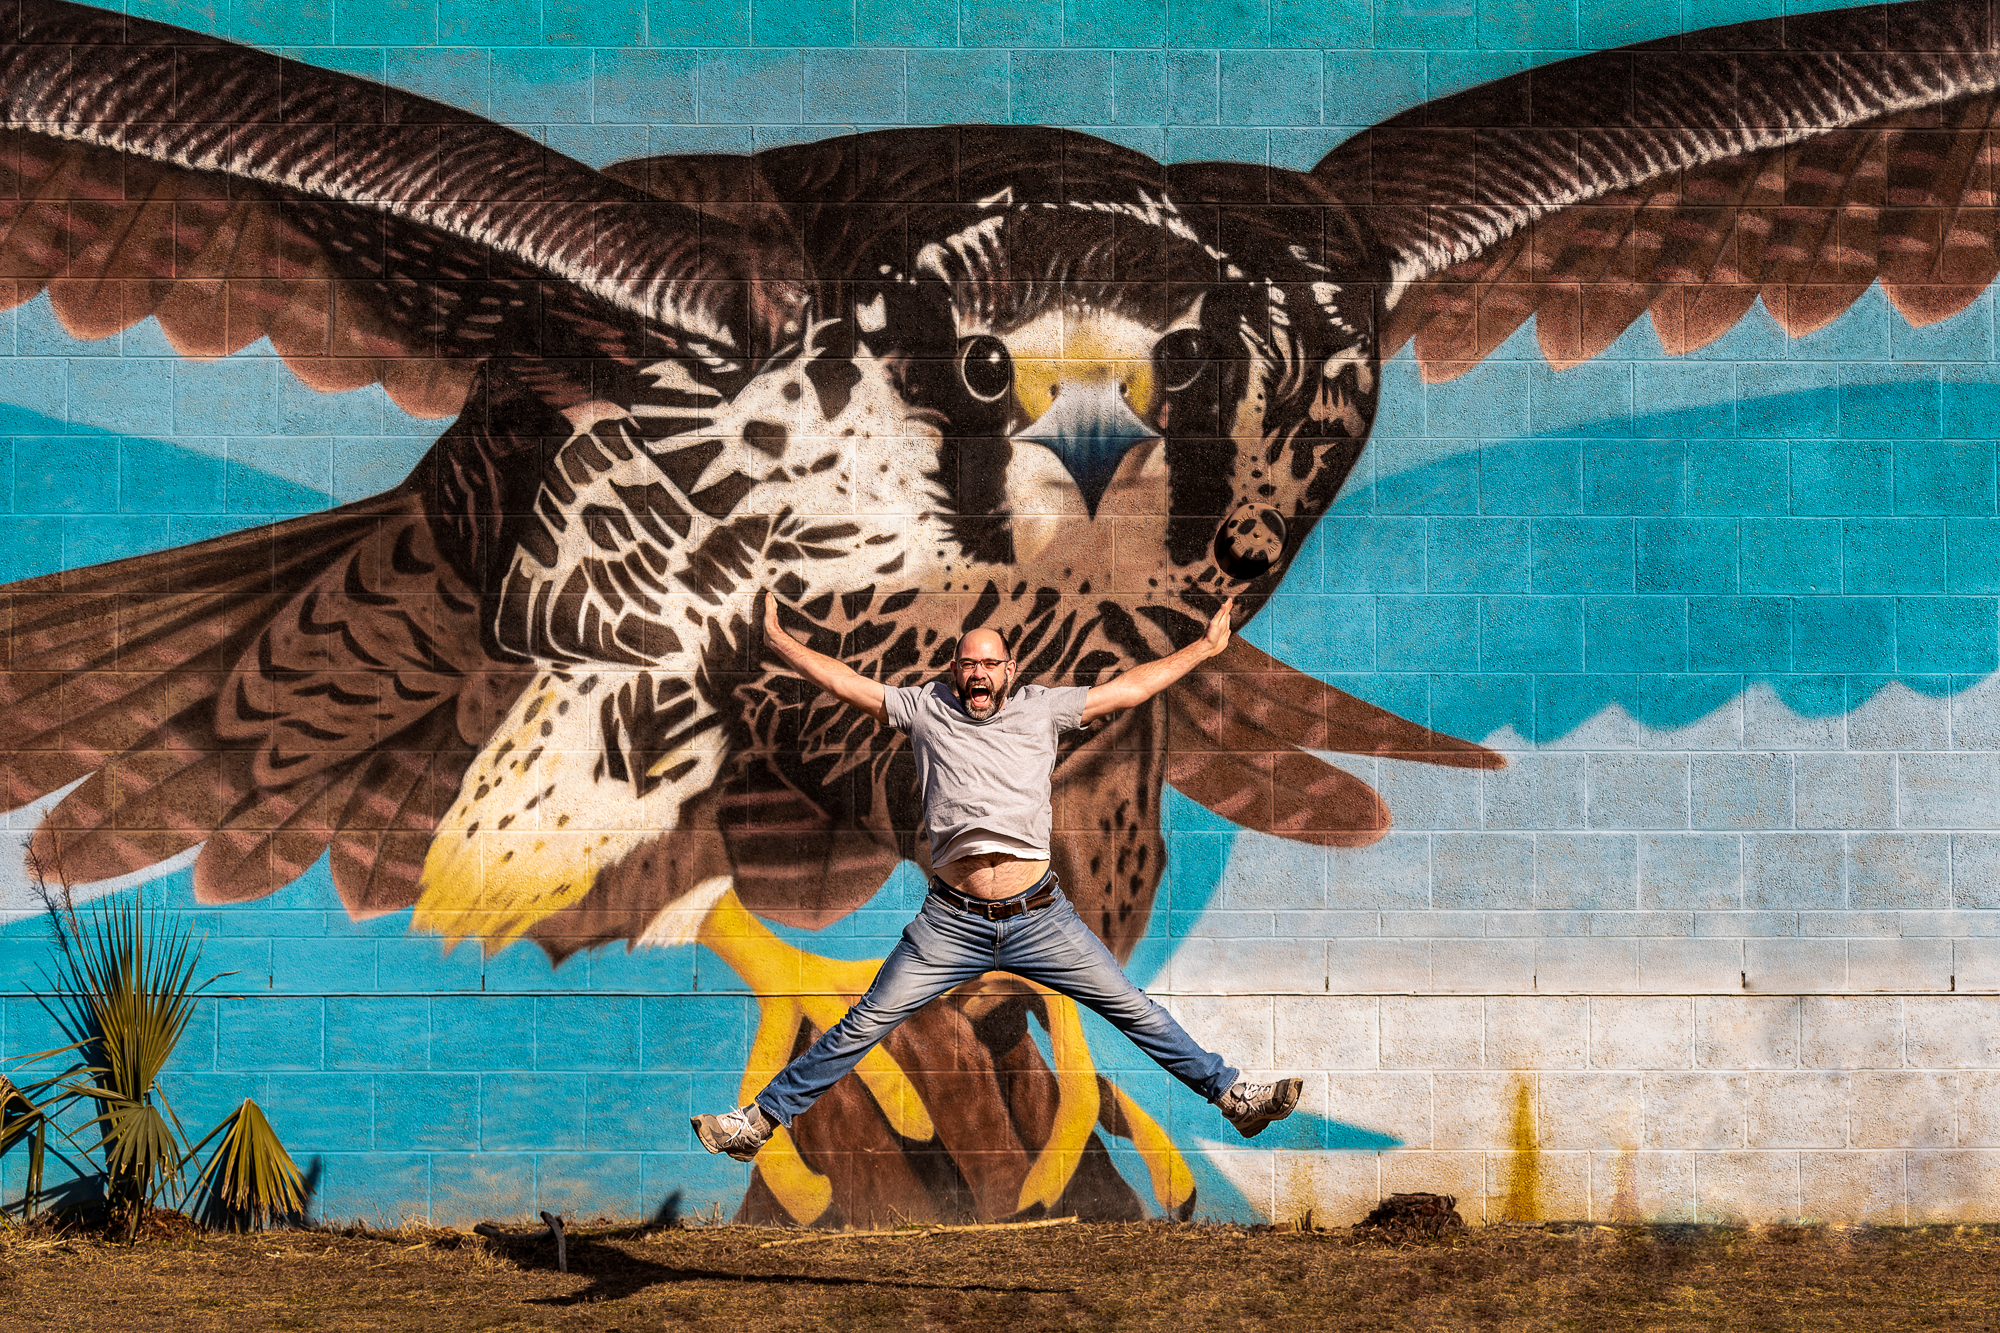 Eagle Flight Chris Baker Evens